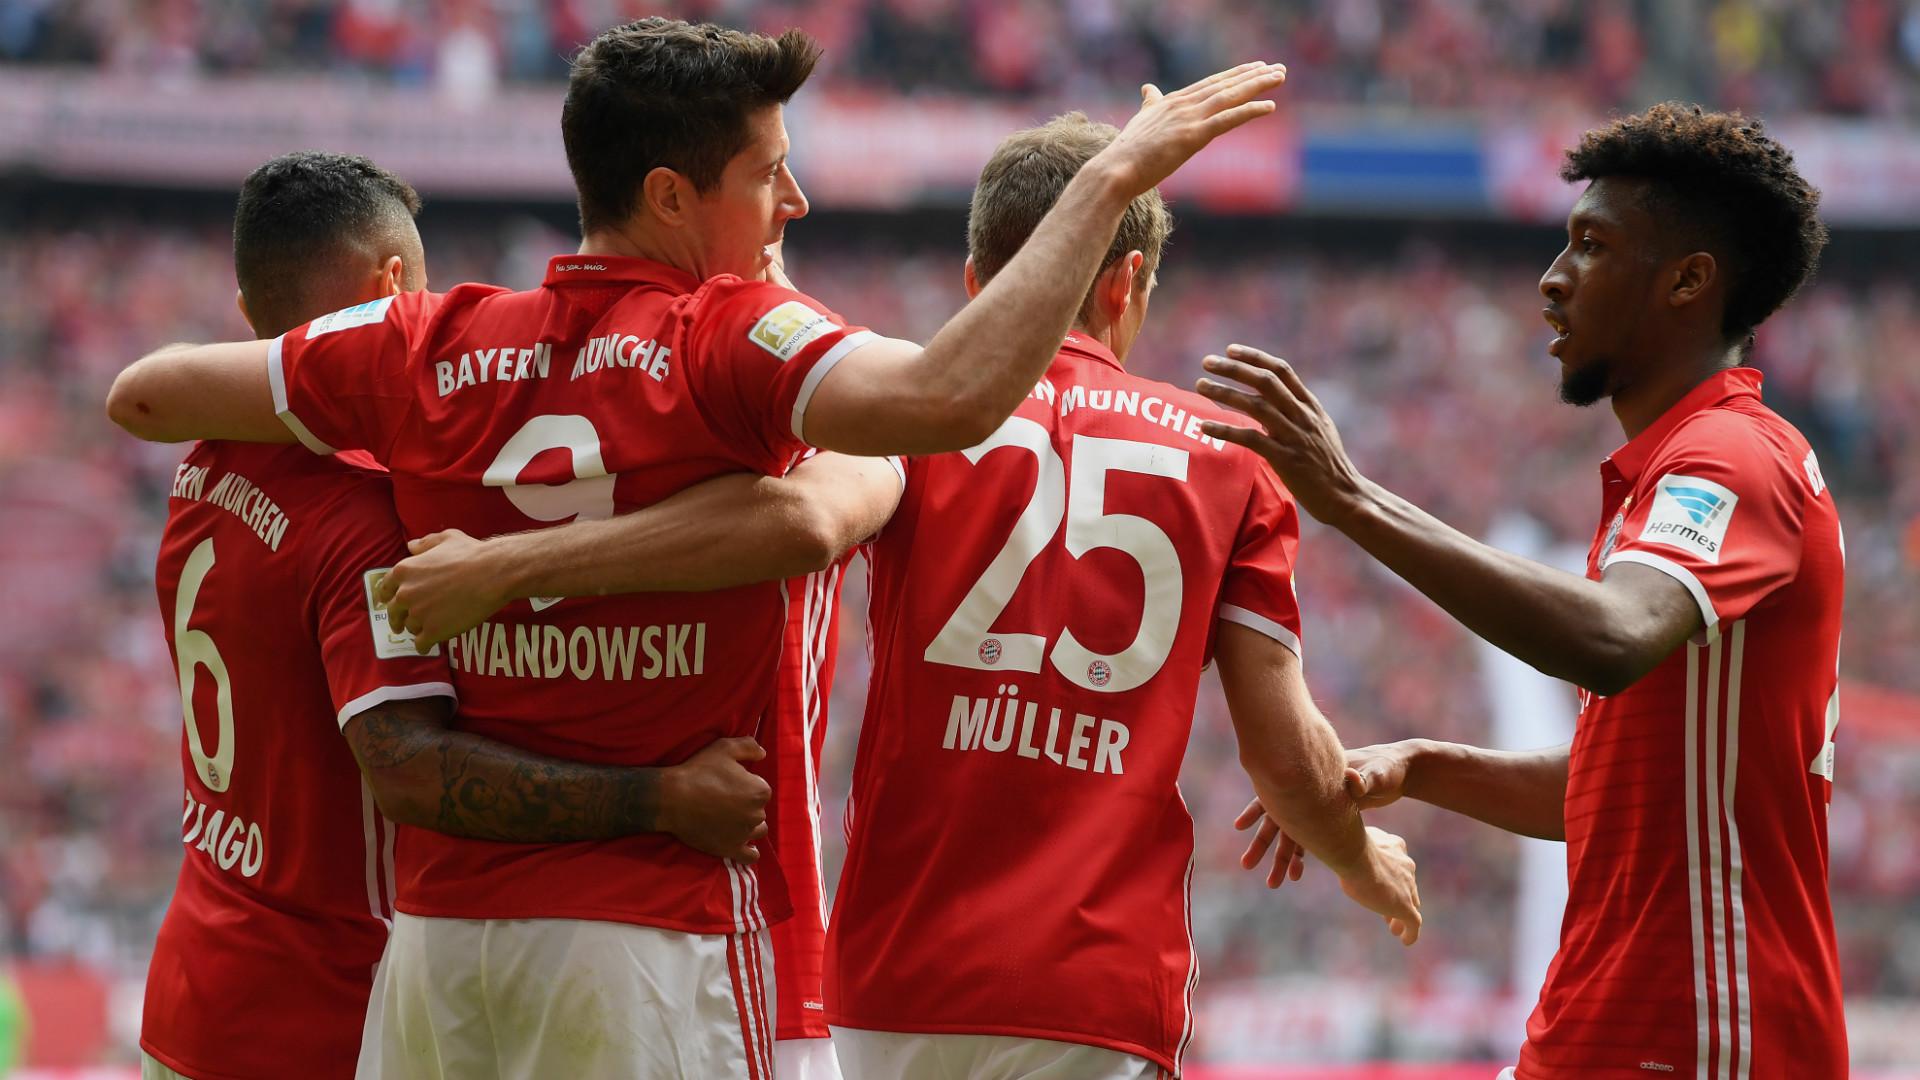 Le Bayern déroule 6-0, Dortmund accroché — All